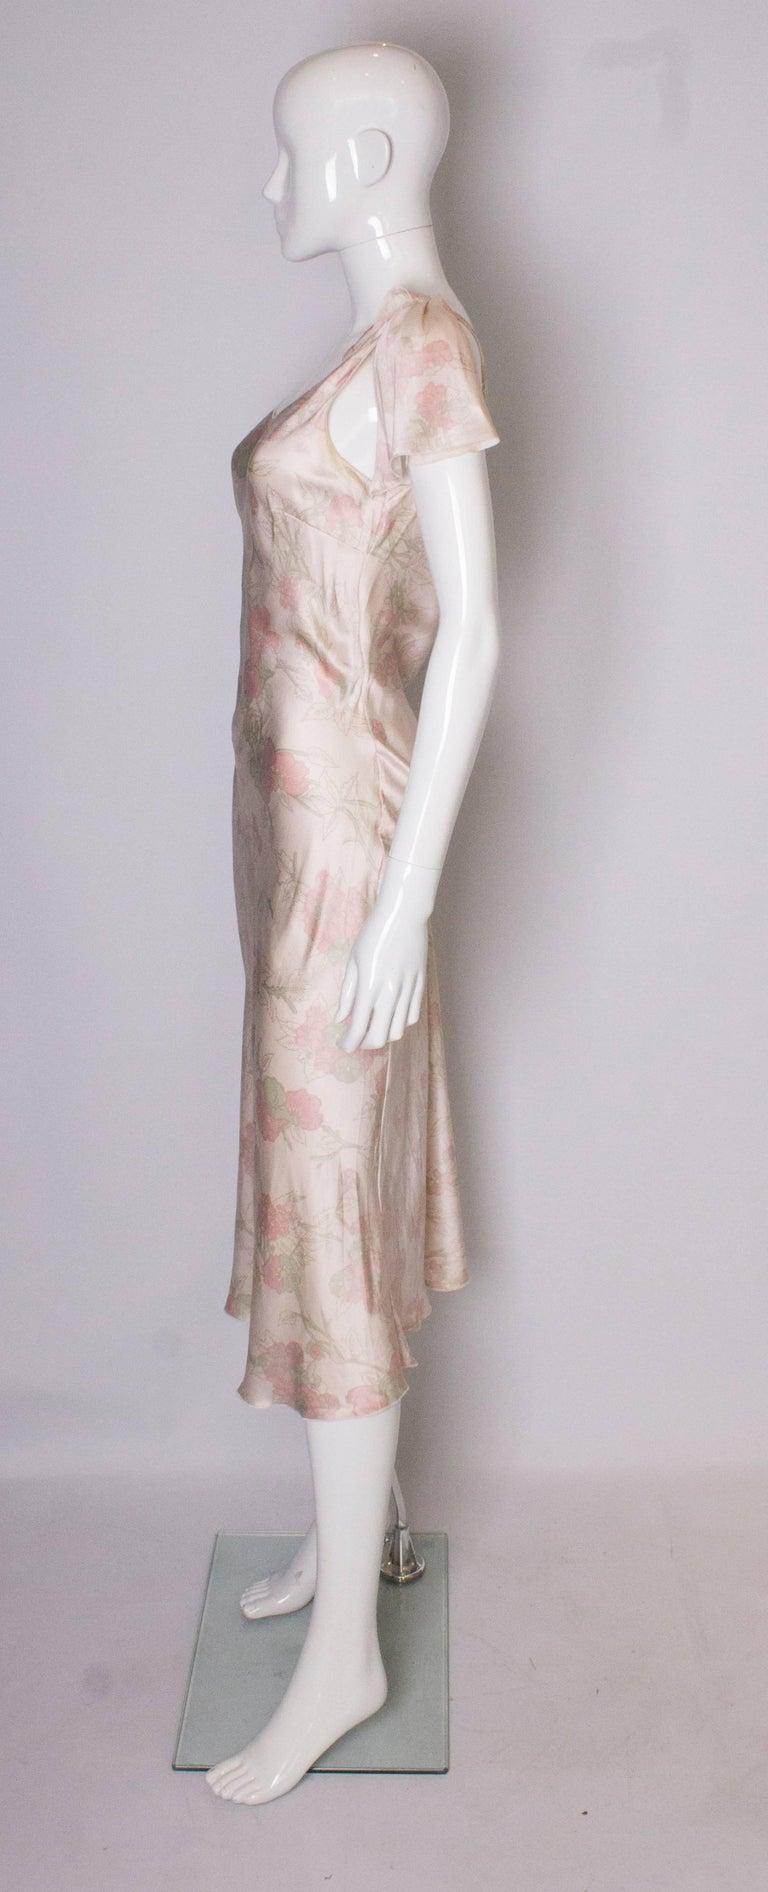 Women's Vintage Ungaro Silk Slip Dress or Nightdress For Sale